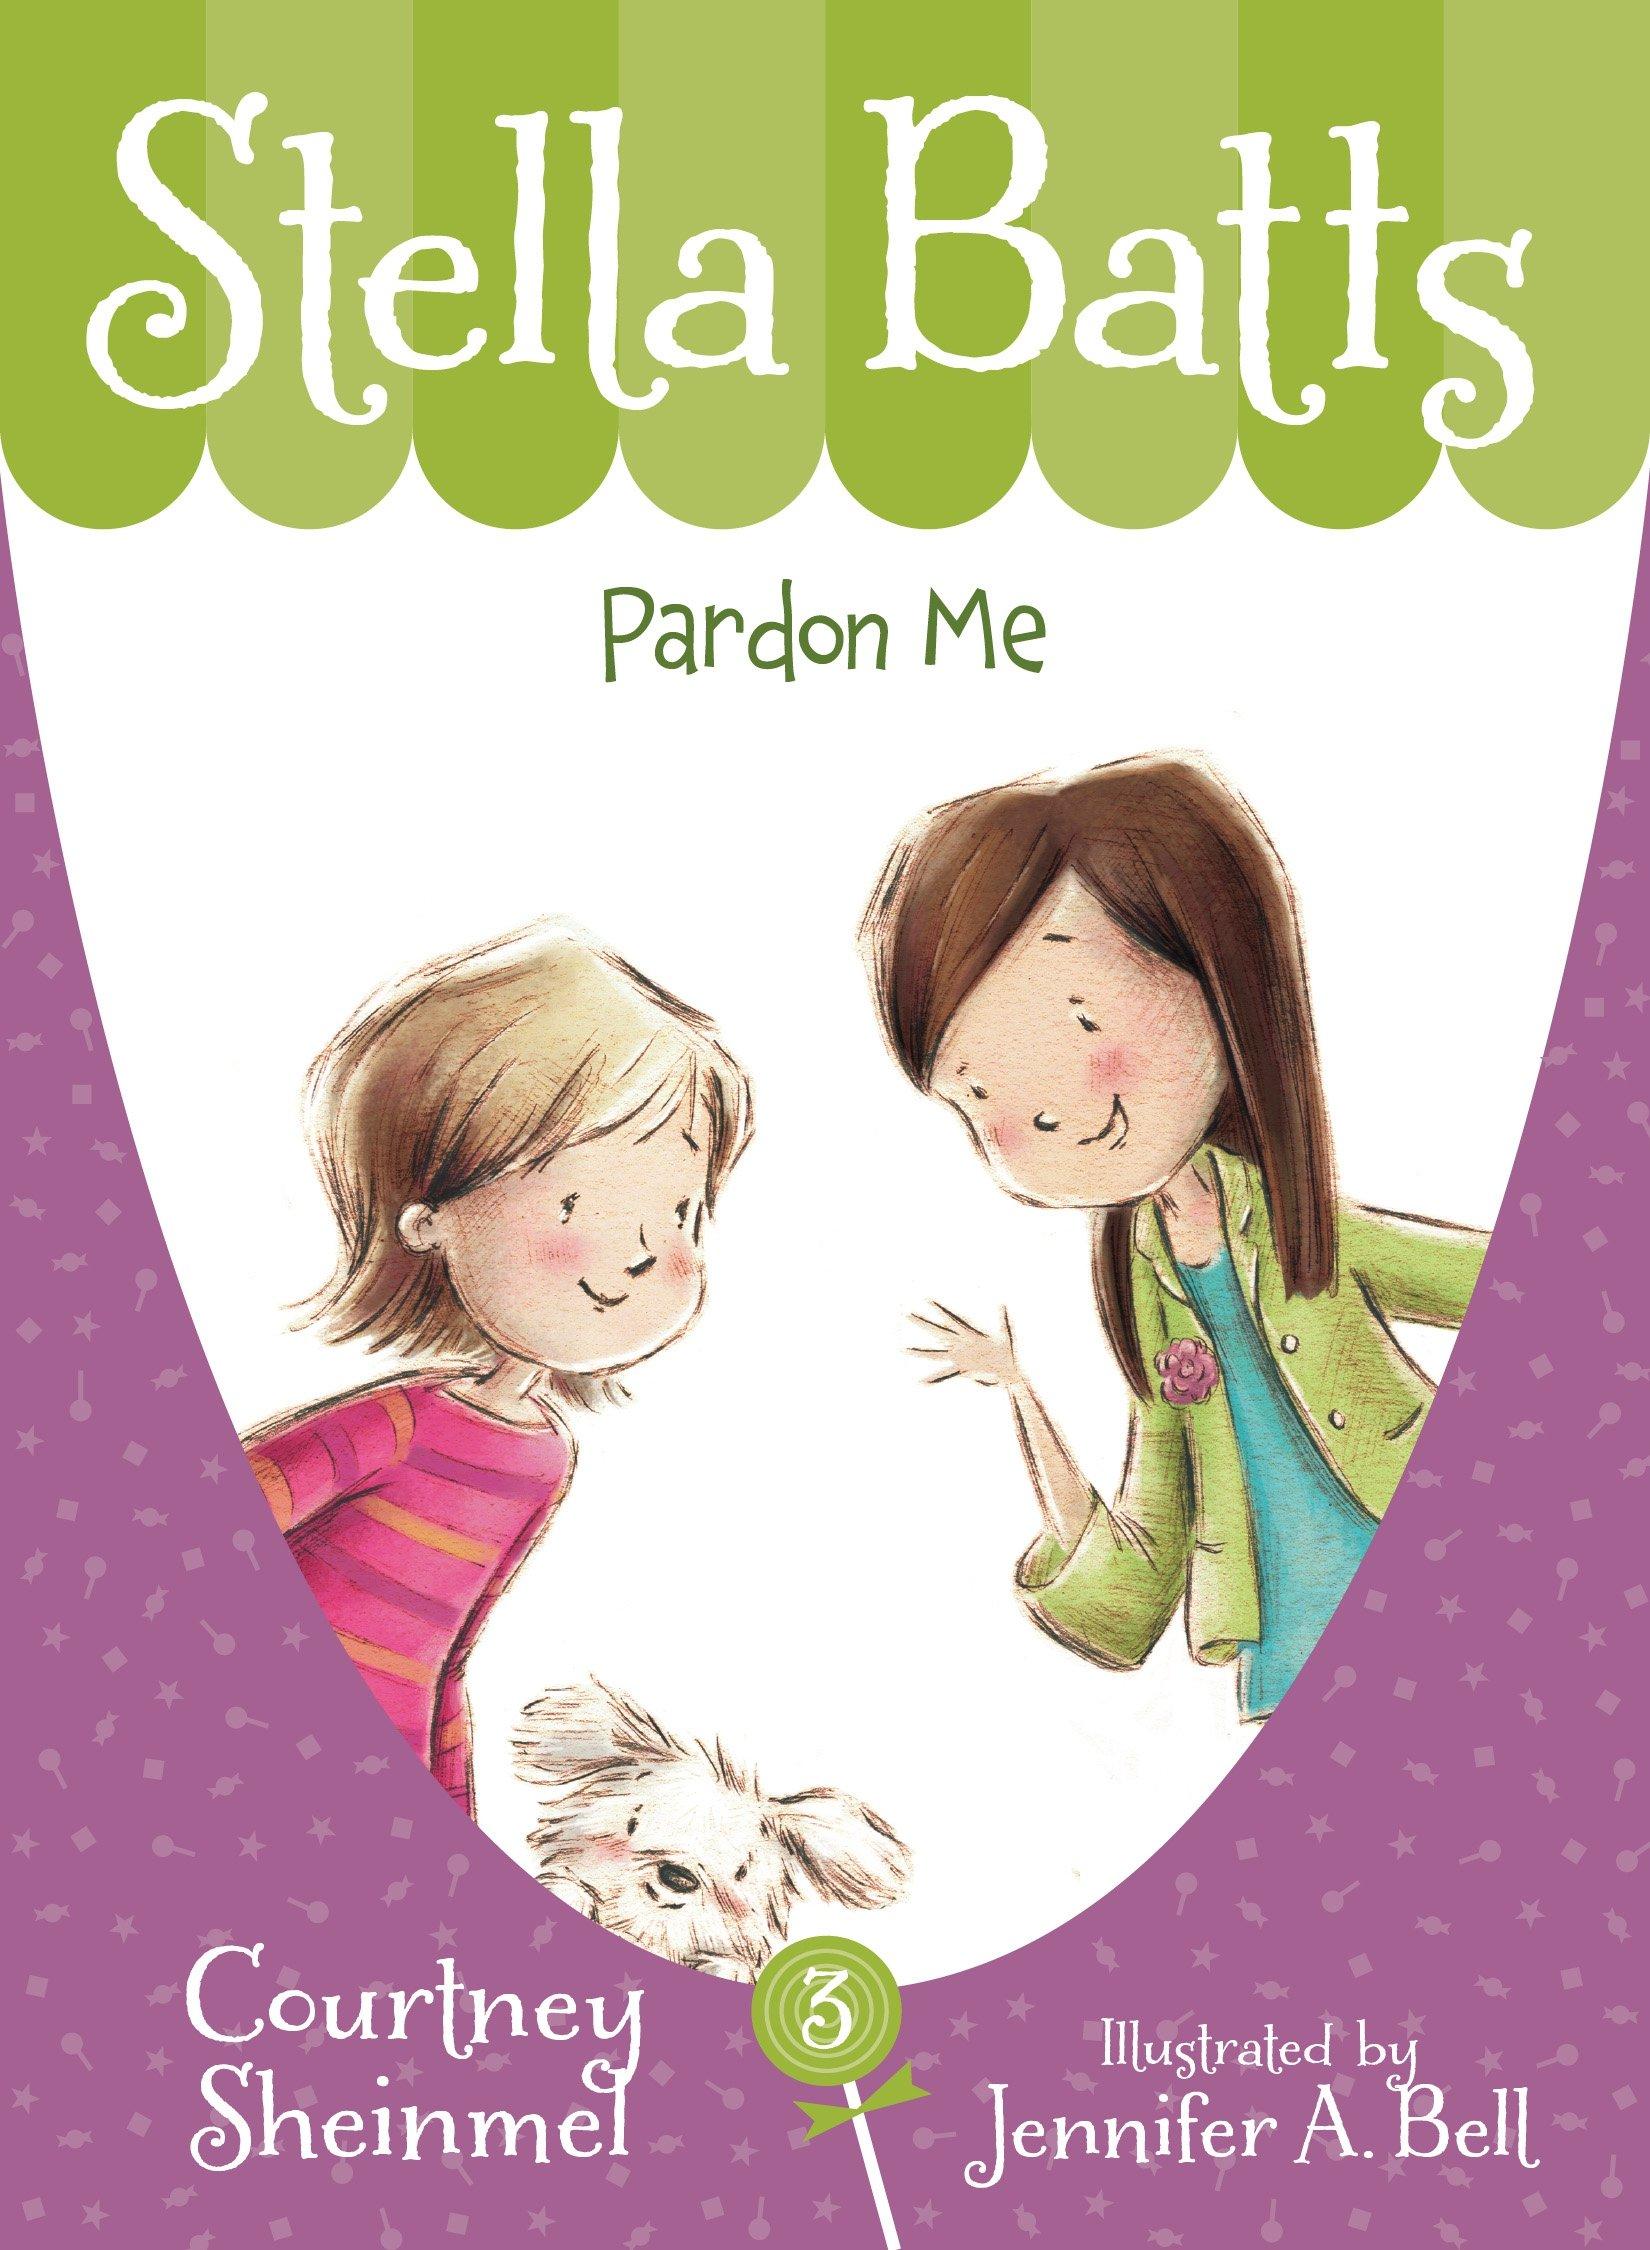 Pardon Me (Stella Batts) ebook